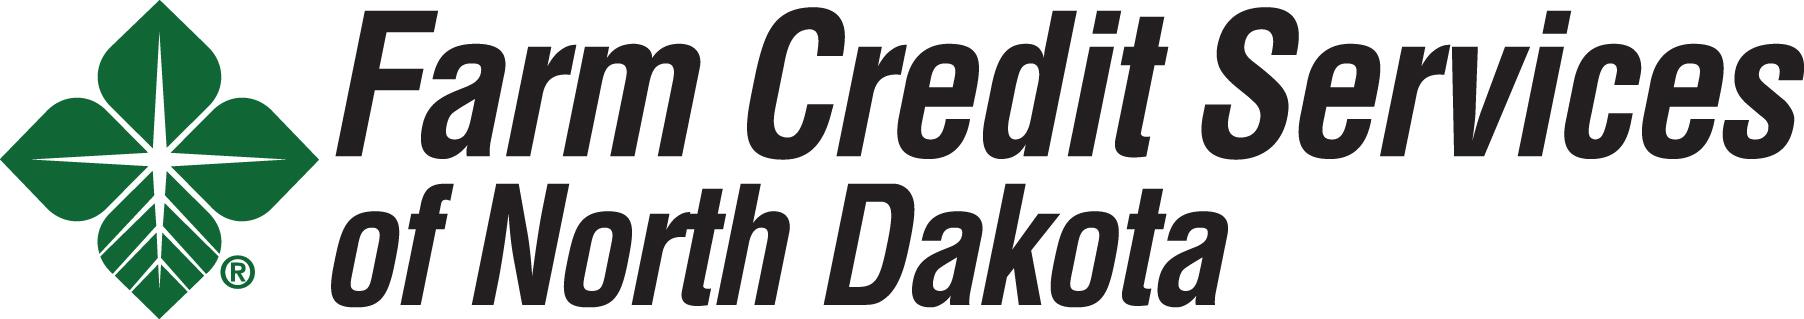 Farm Credit Services of North Dakota